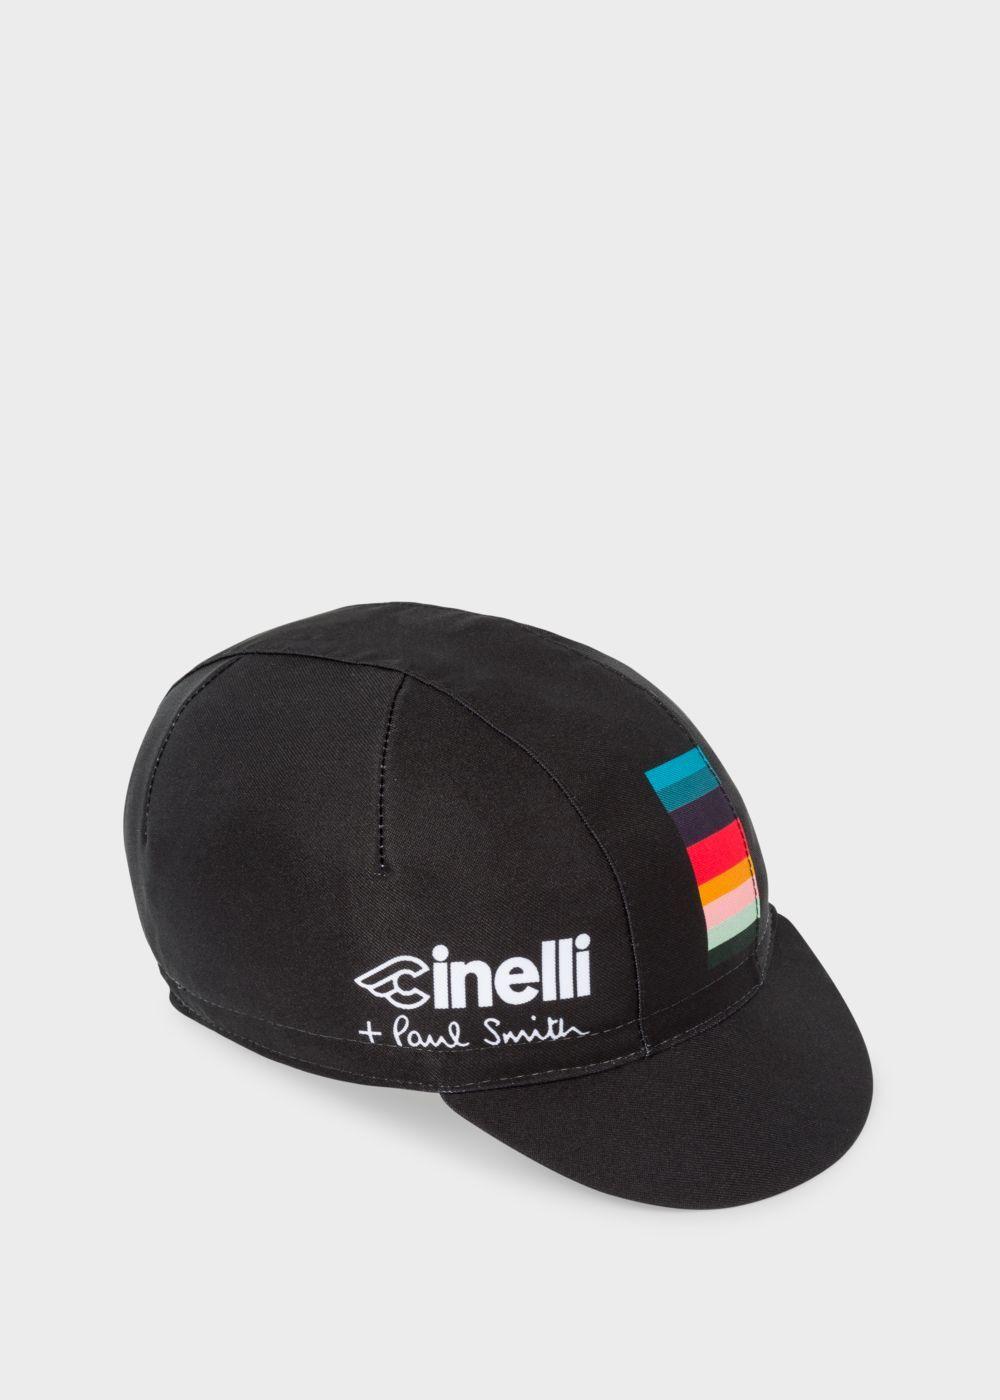 669b52b86f3 Paul Smith + Cinelli Black  Artist Stripe  Detail Cycling Cap - Paul Smith  US